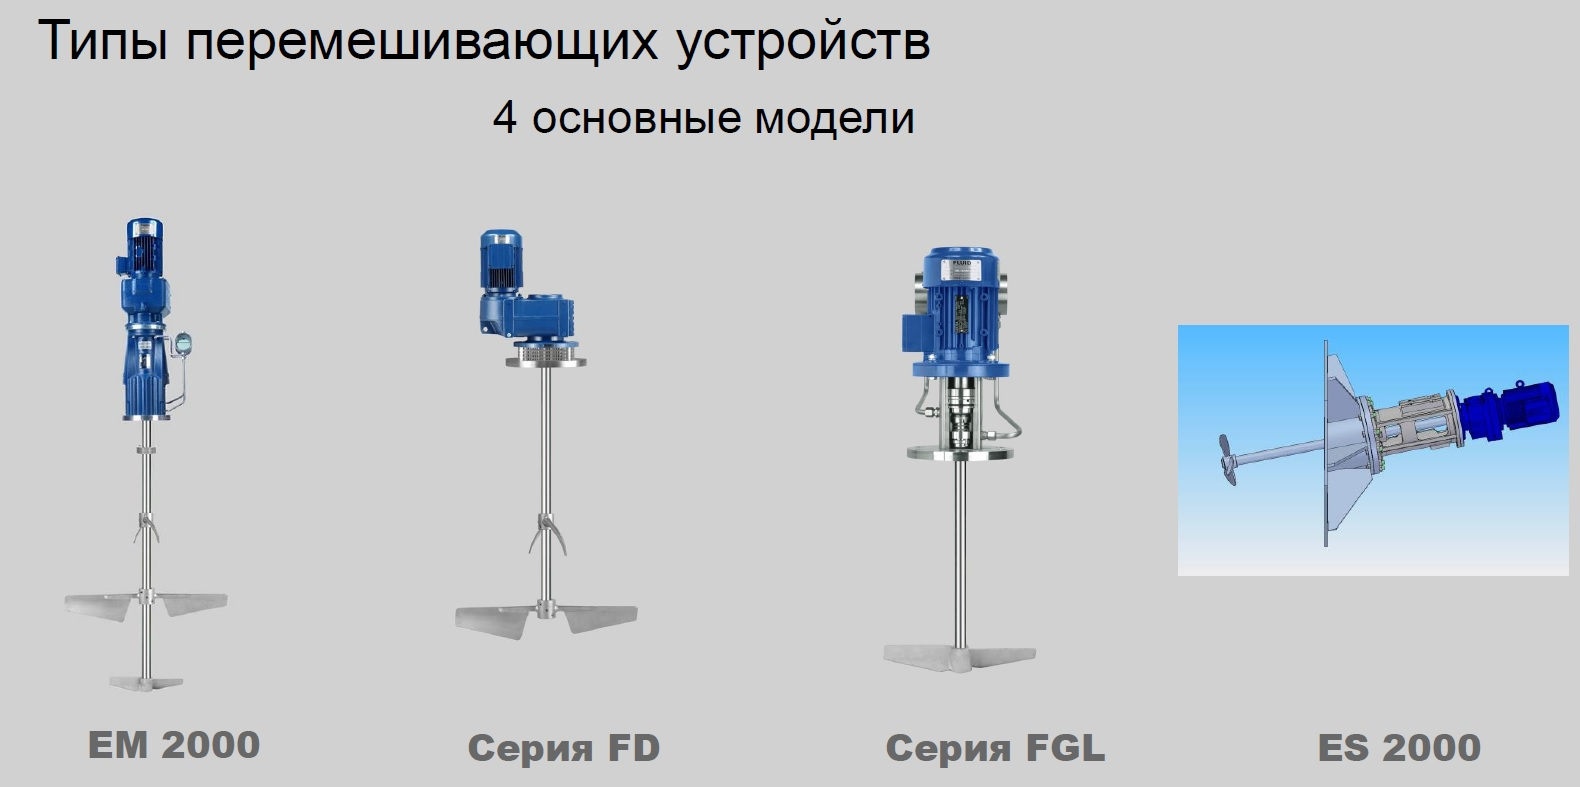 ekato industry5.jpg